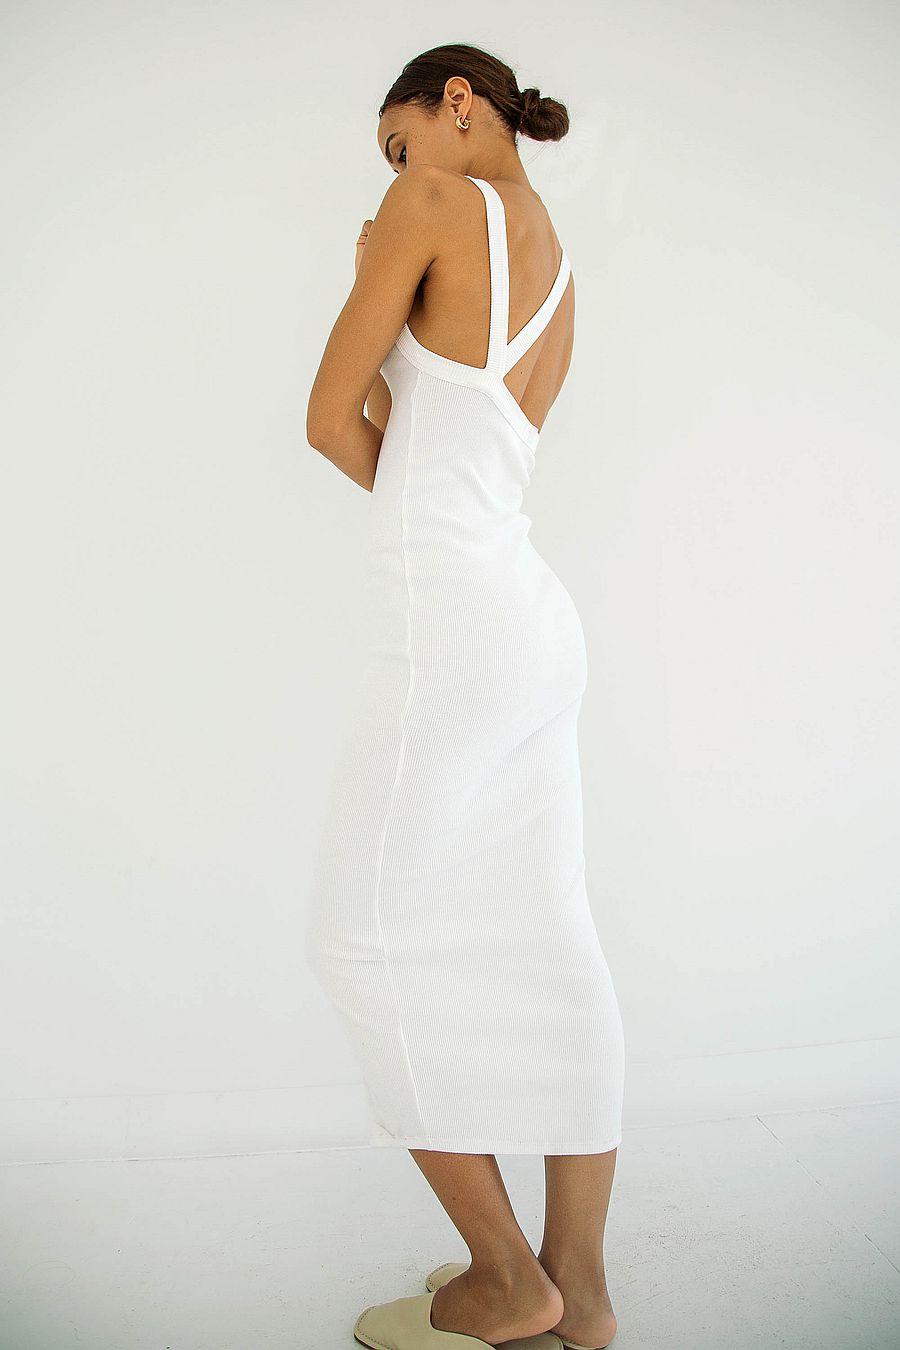 The Line by K Maribel Dress - Off-White